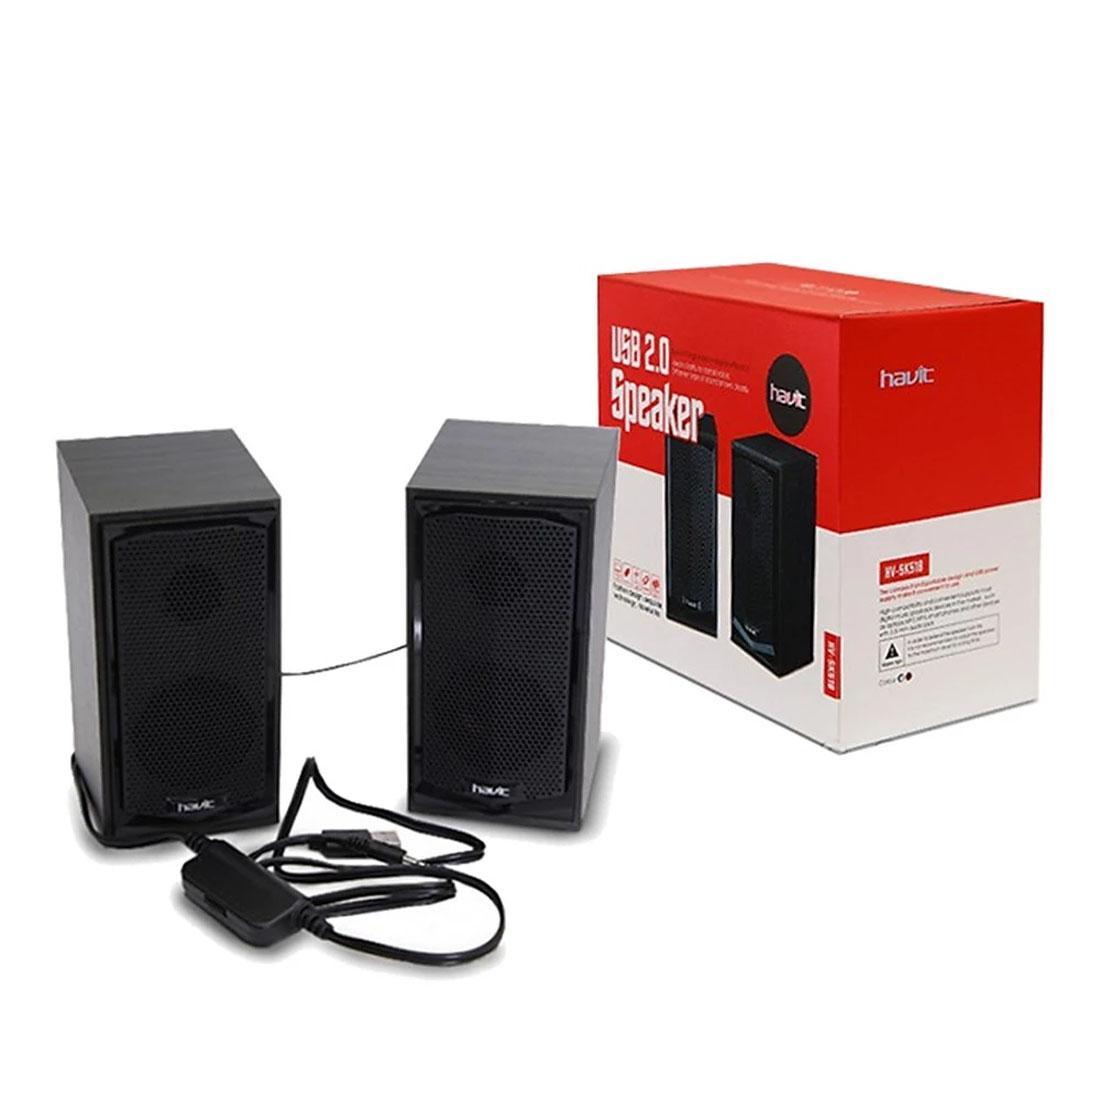 Havit HV-SK518 USB Powered 2.0 Wood Speaker_Black color: Buy Sell Online @  Best Prices in SriLanka | Daraz.lk